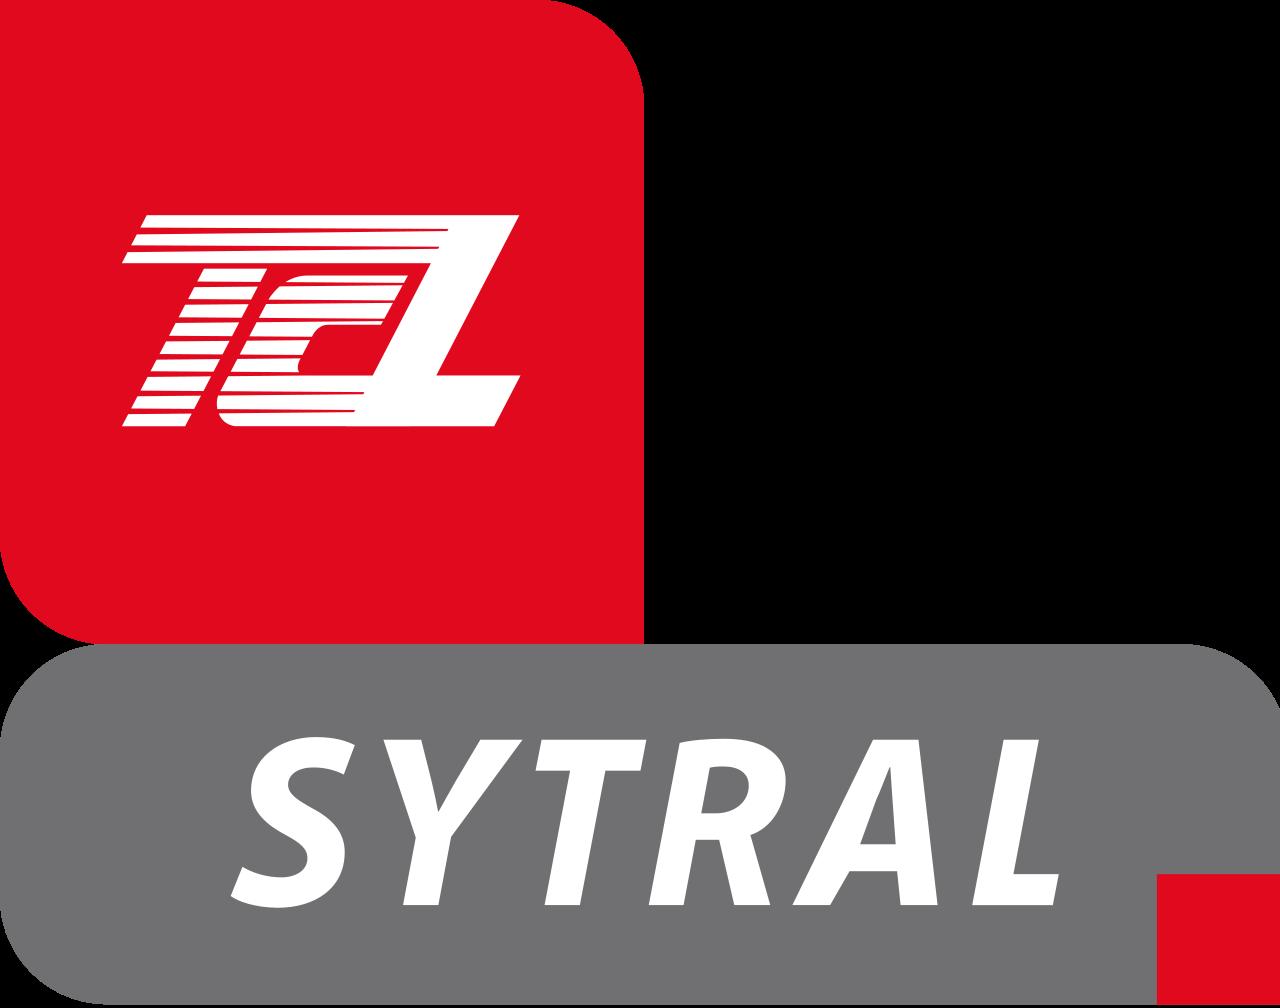 Tcl logo png 8 » PNG Image.